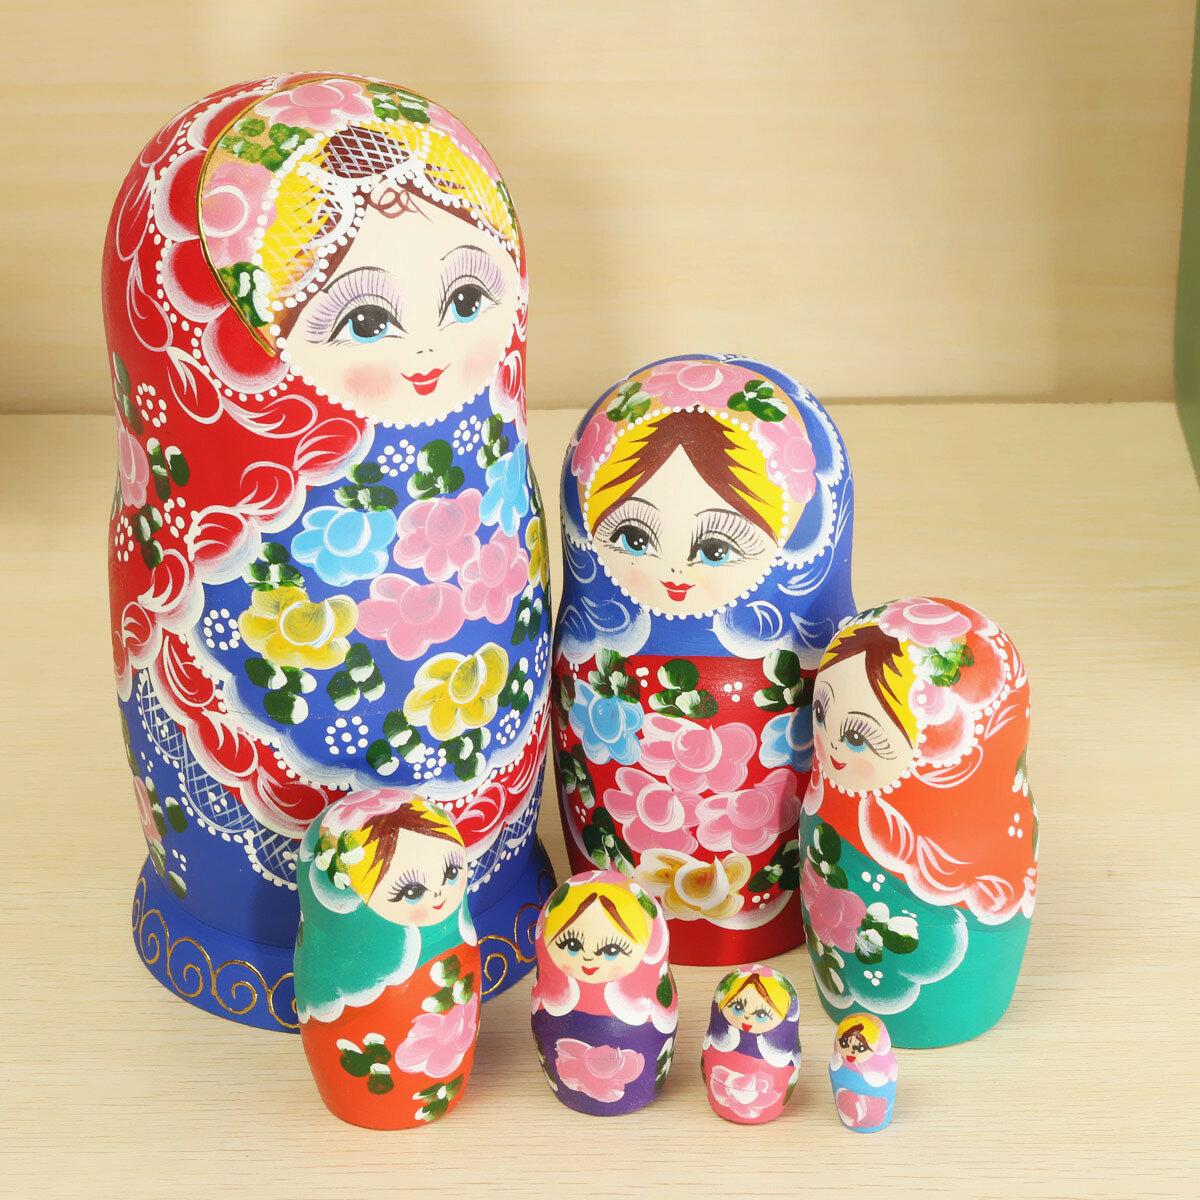 matryoshka set of 7 nesting dolls madness russian wooden dolls toy